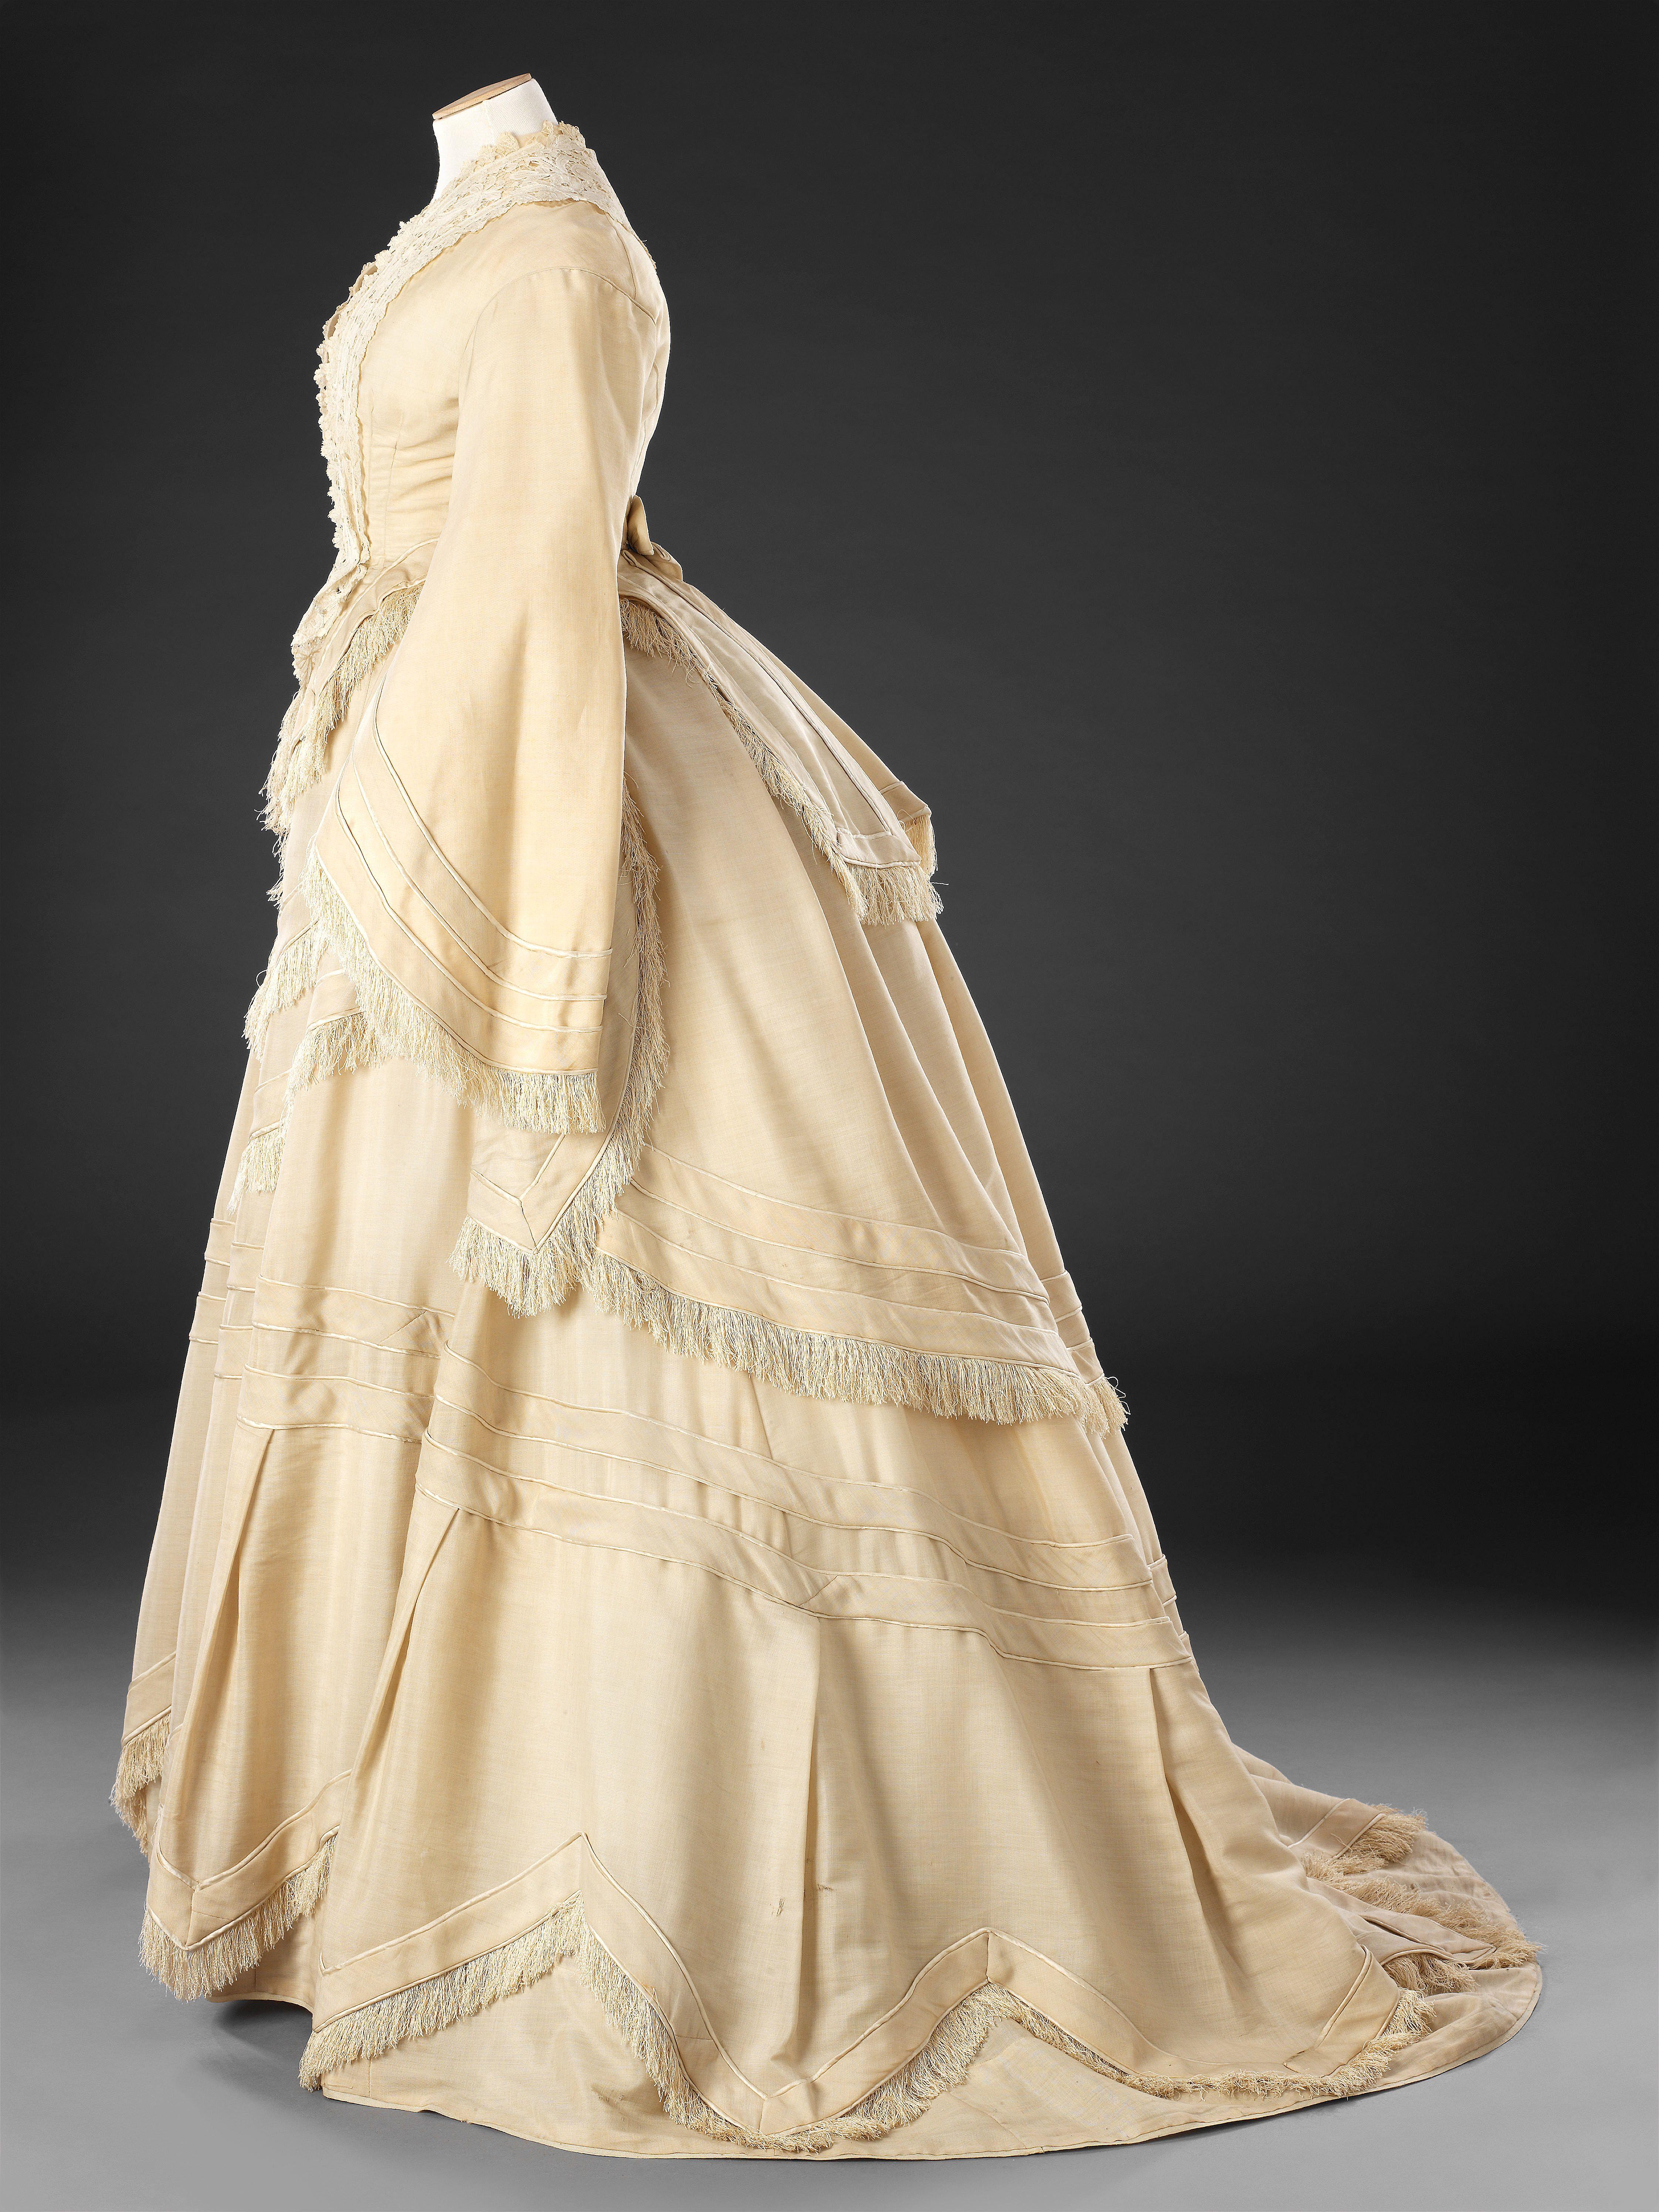 dress fashion pinterest costume dress